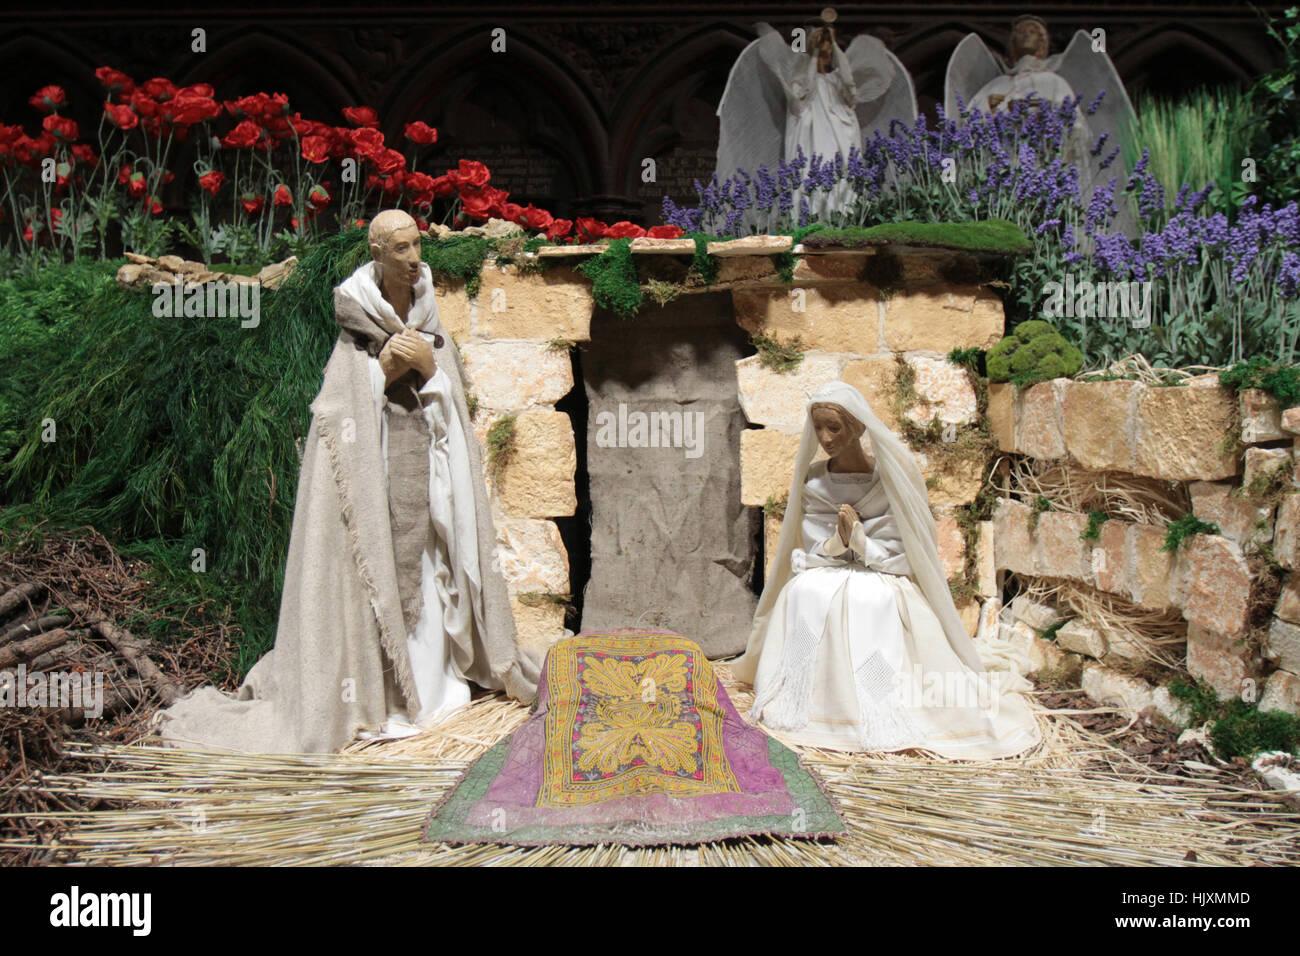 La Sainte Famille. Crèche. - Stock Image